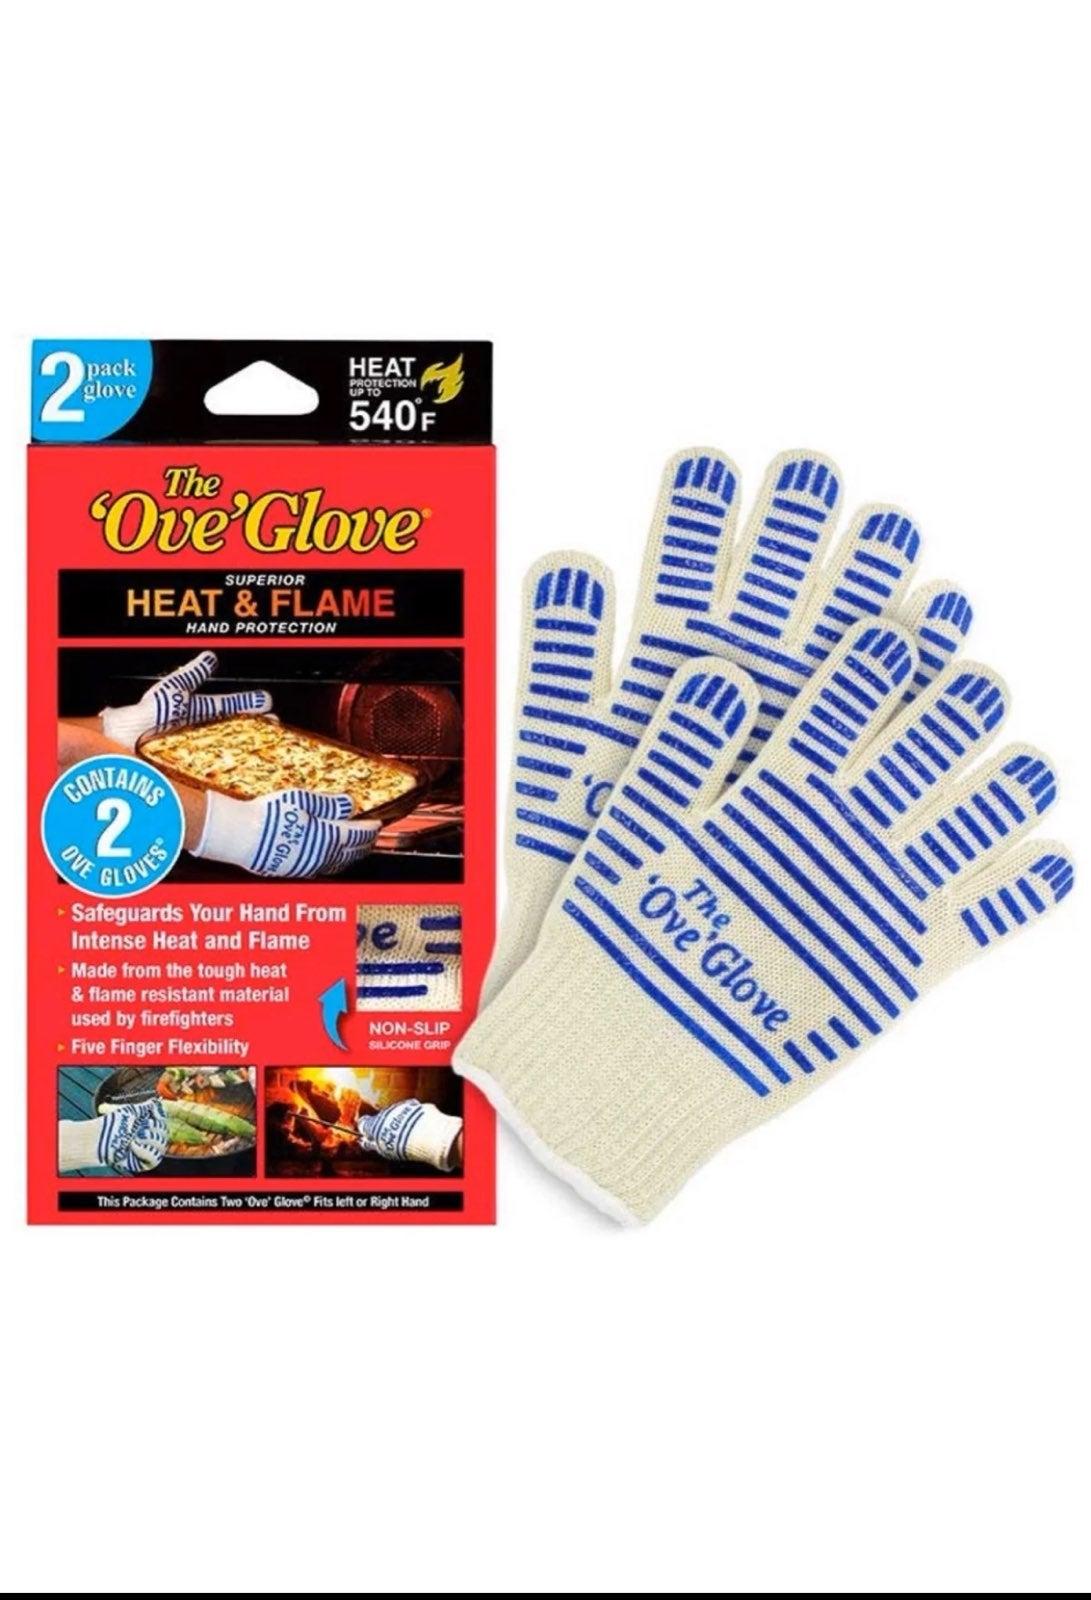 The Ove Glove - Superior HEAT & FLAME